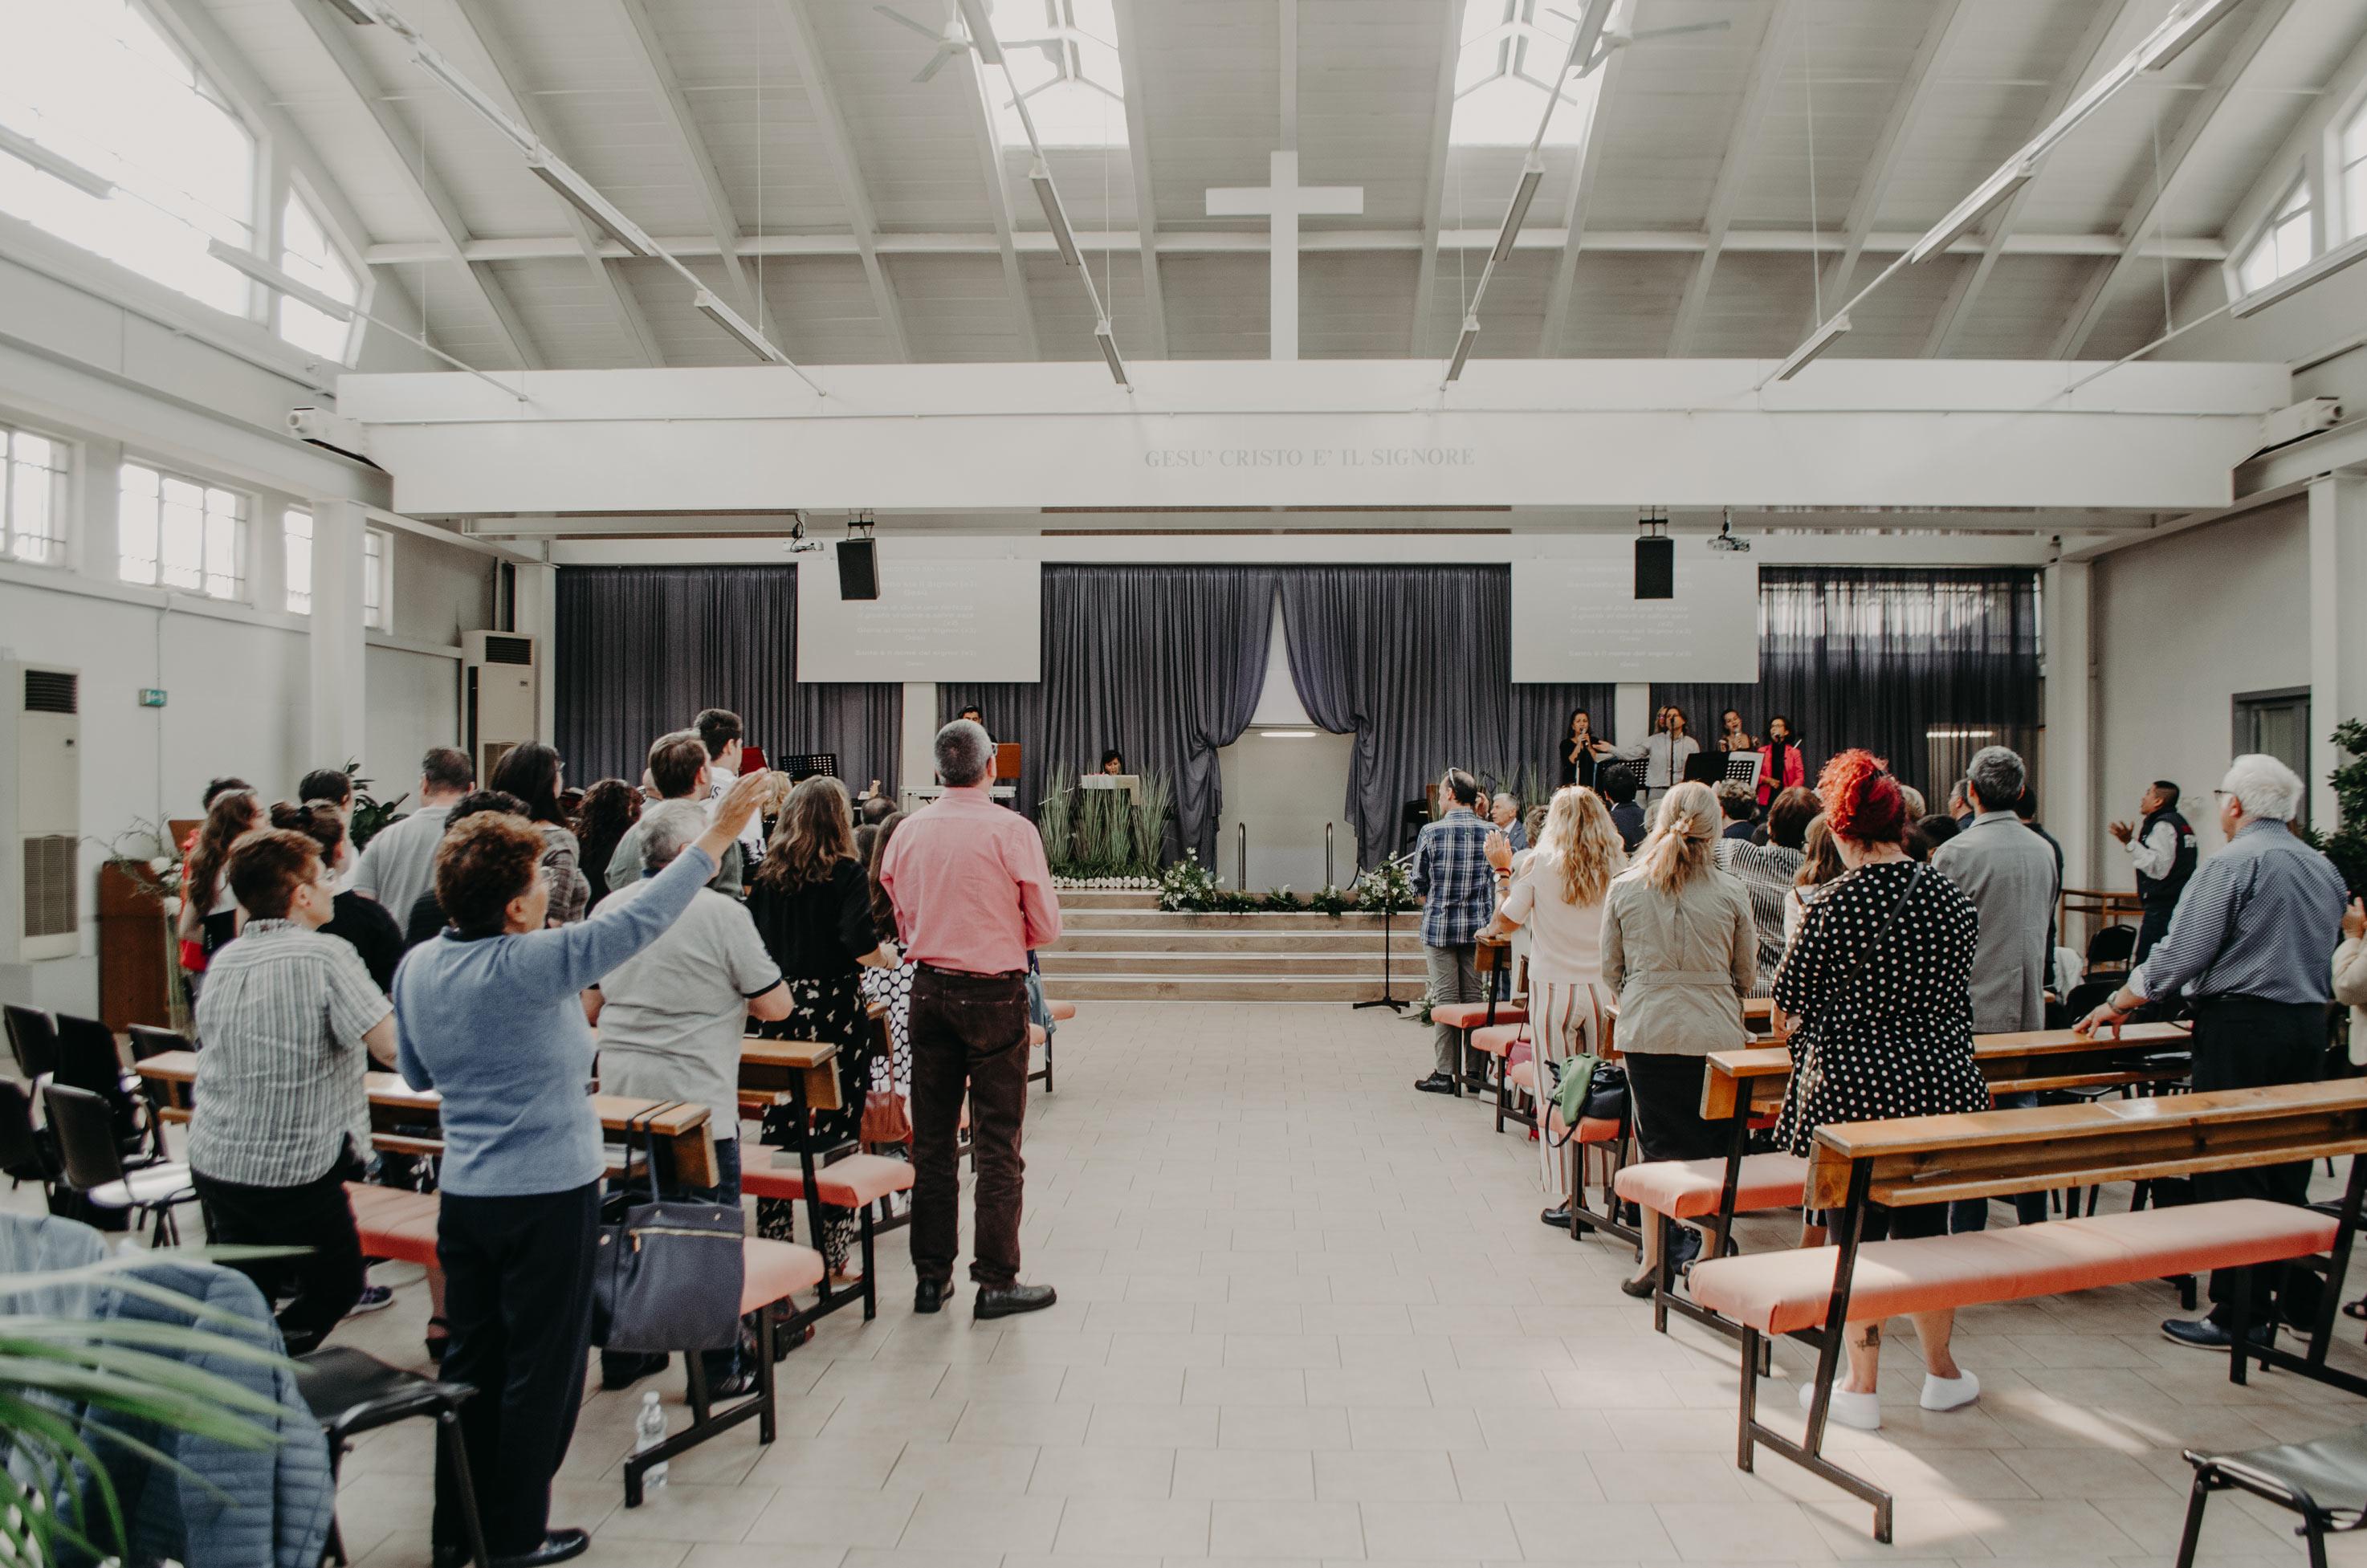 Vivere la Chiesa